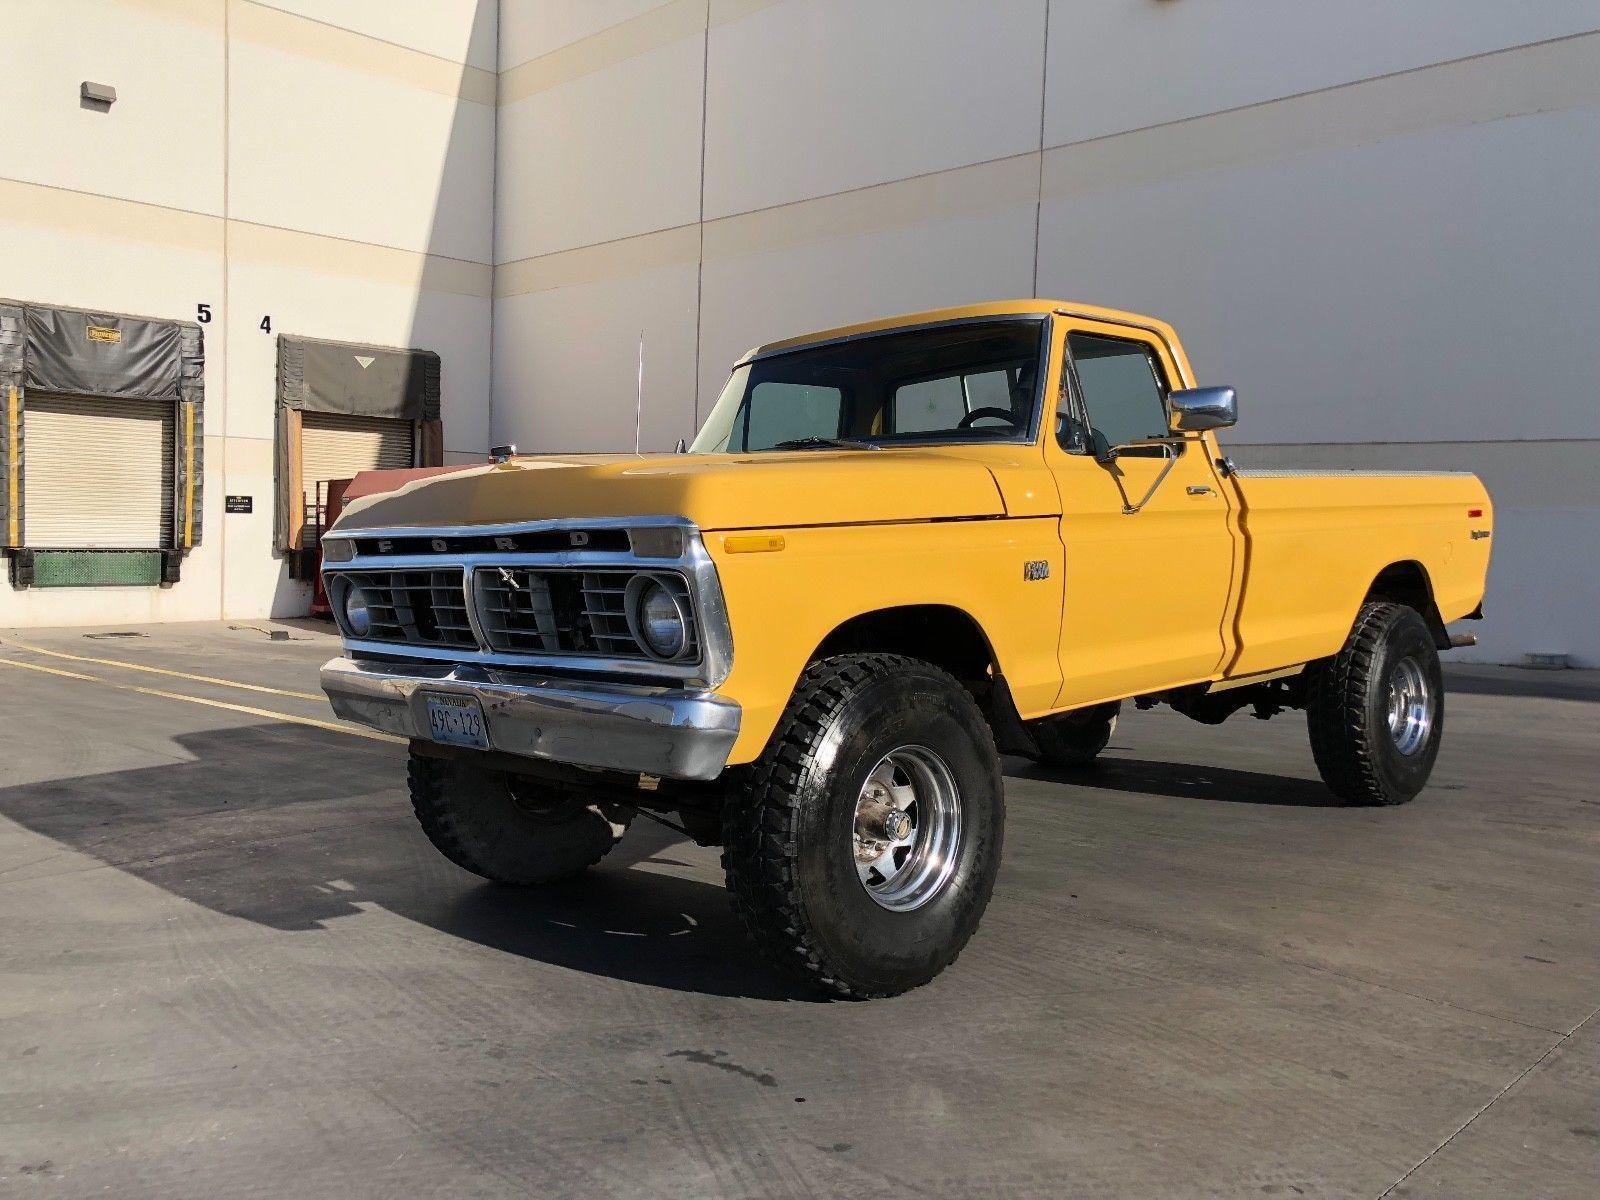 Ebay 1975 Ford F 250 Classic 4x4 Factory Highboy Explorer Pickup Ranger Xlt Truck F250 Survivor Classiccars Cars